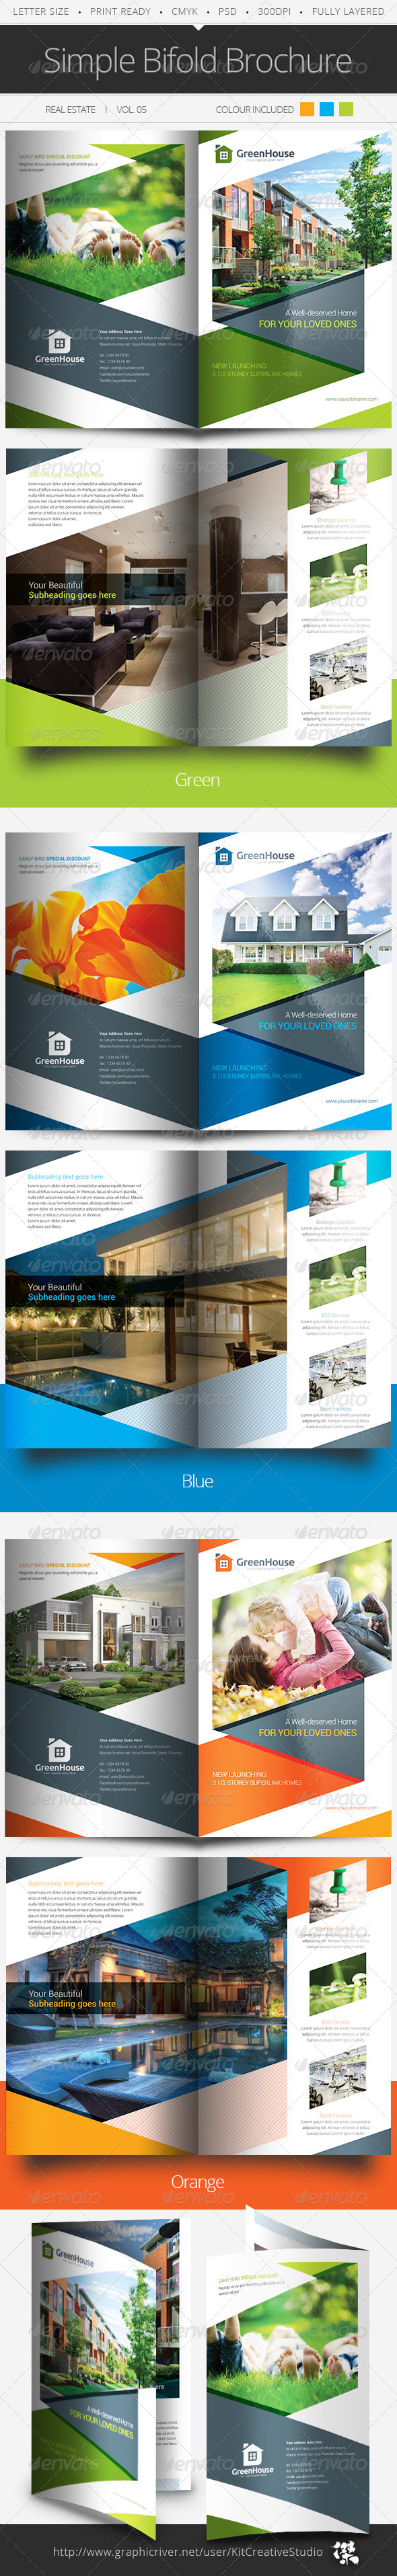 GraphicRiver Simple Bifold Brochure Vol.05 5984057